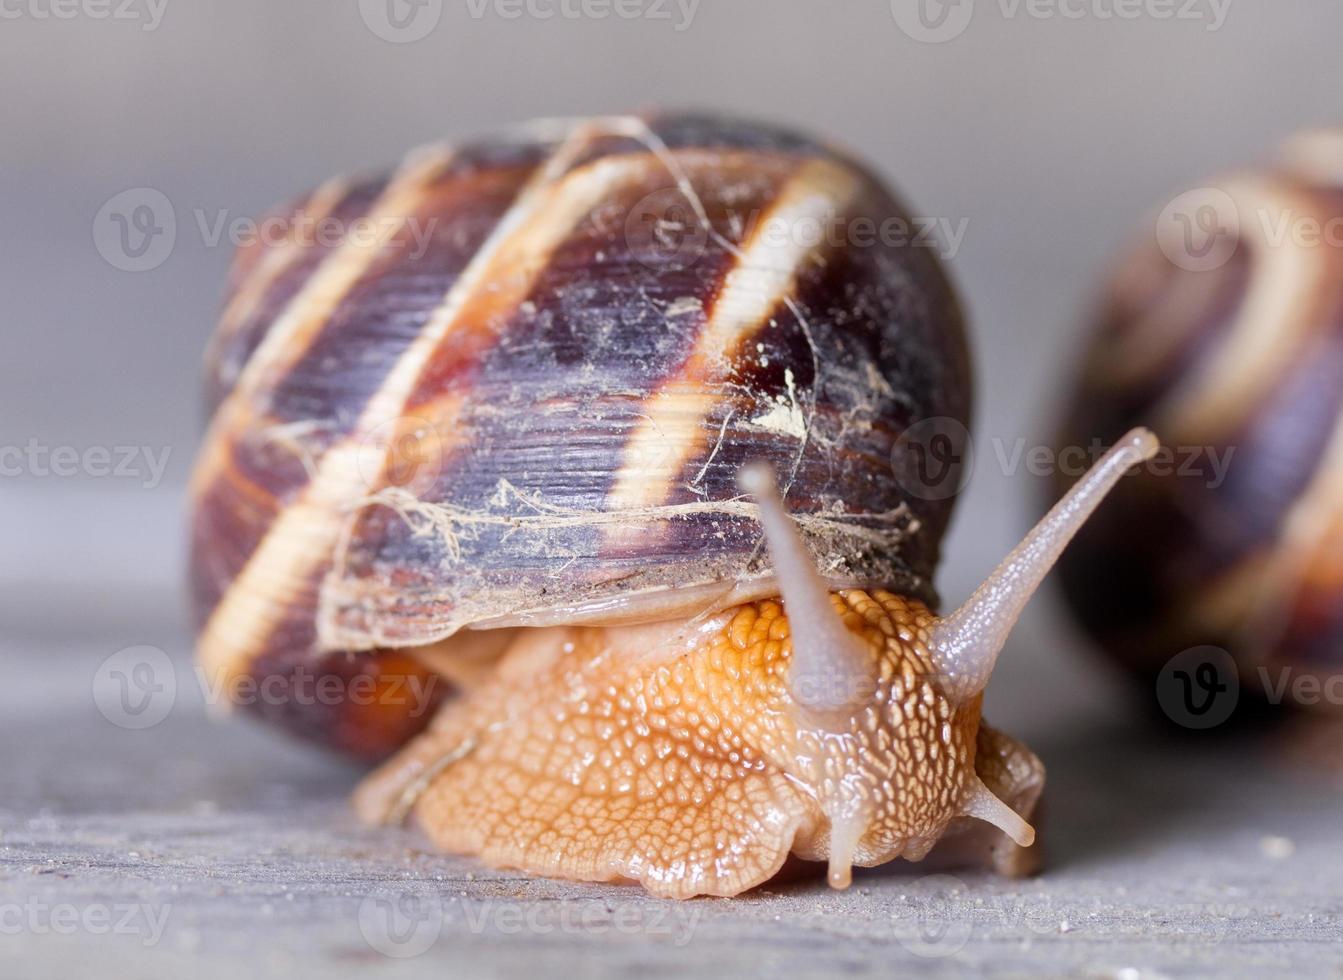 Grape snail close-up photo